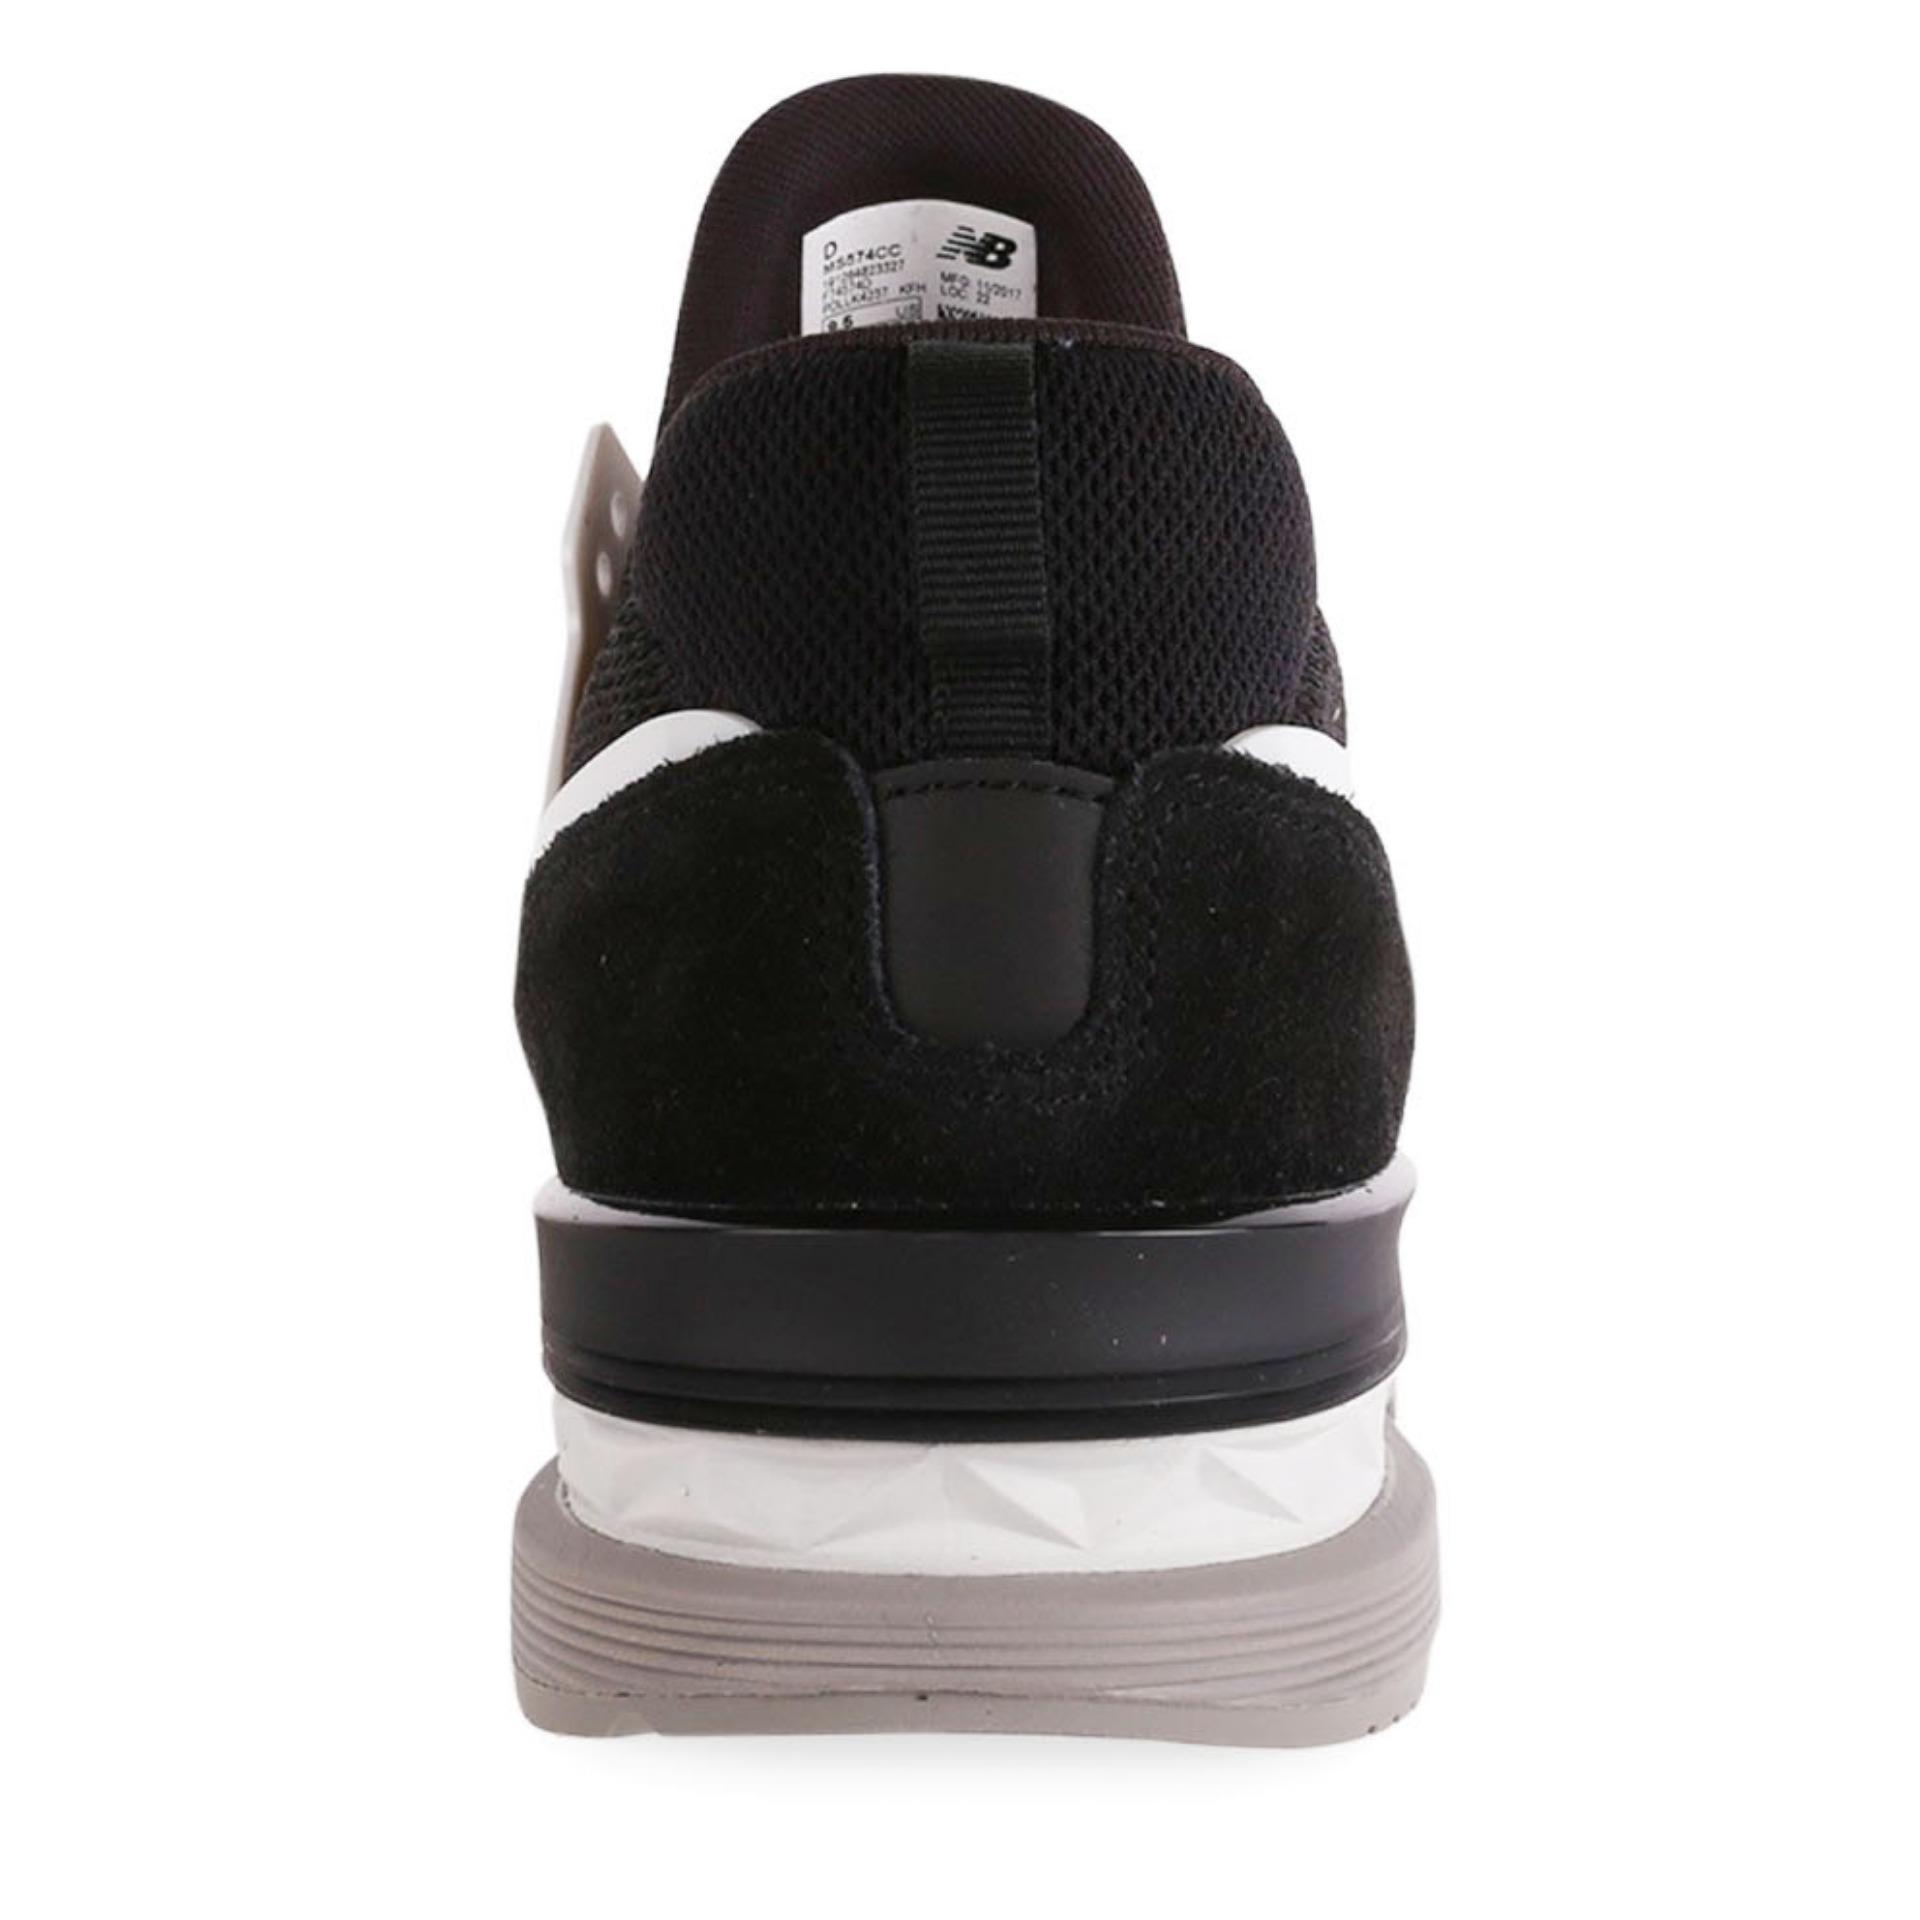 Sepatu Nb New Balance 574 Pria Laki Cowok Casual Santai 565 Sneakers Hitam Suede Heather 3